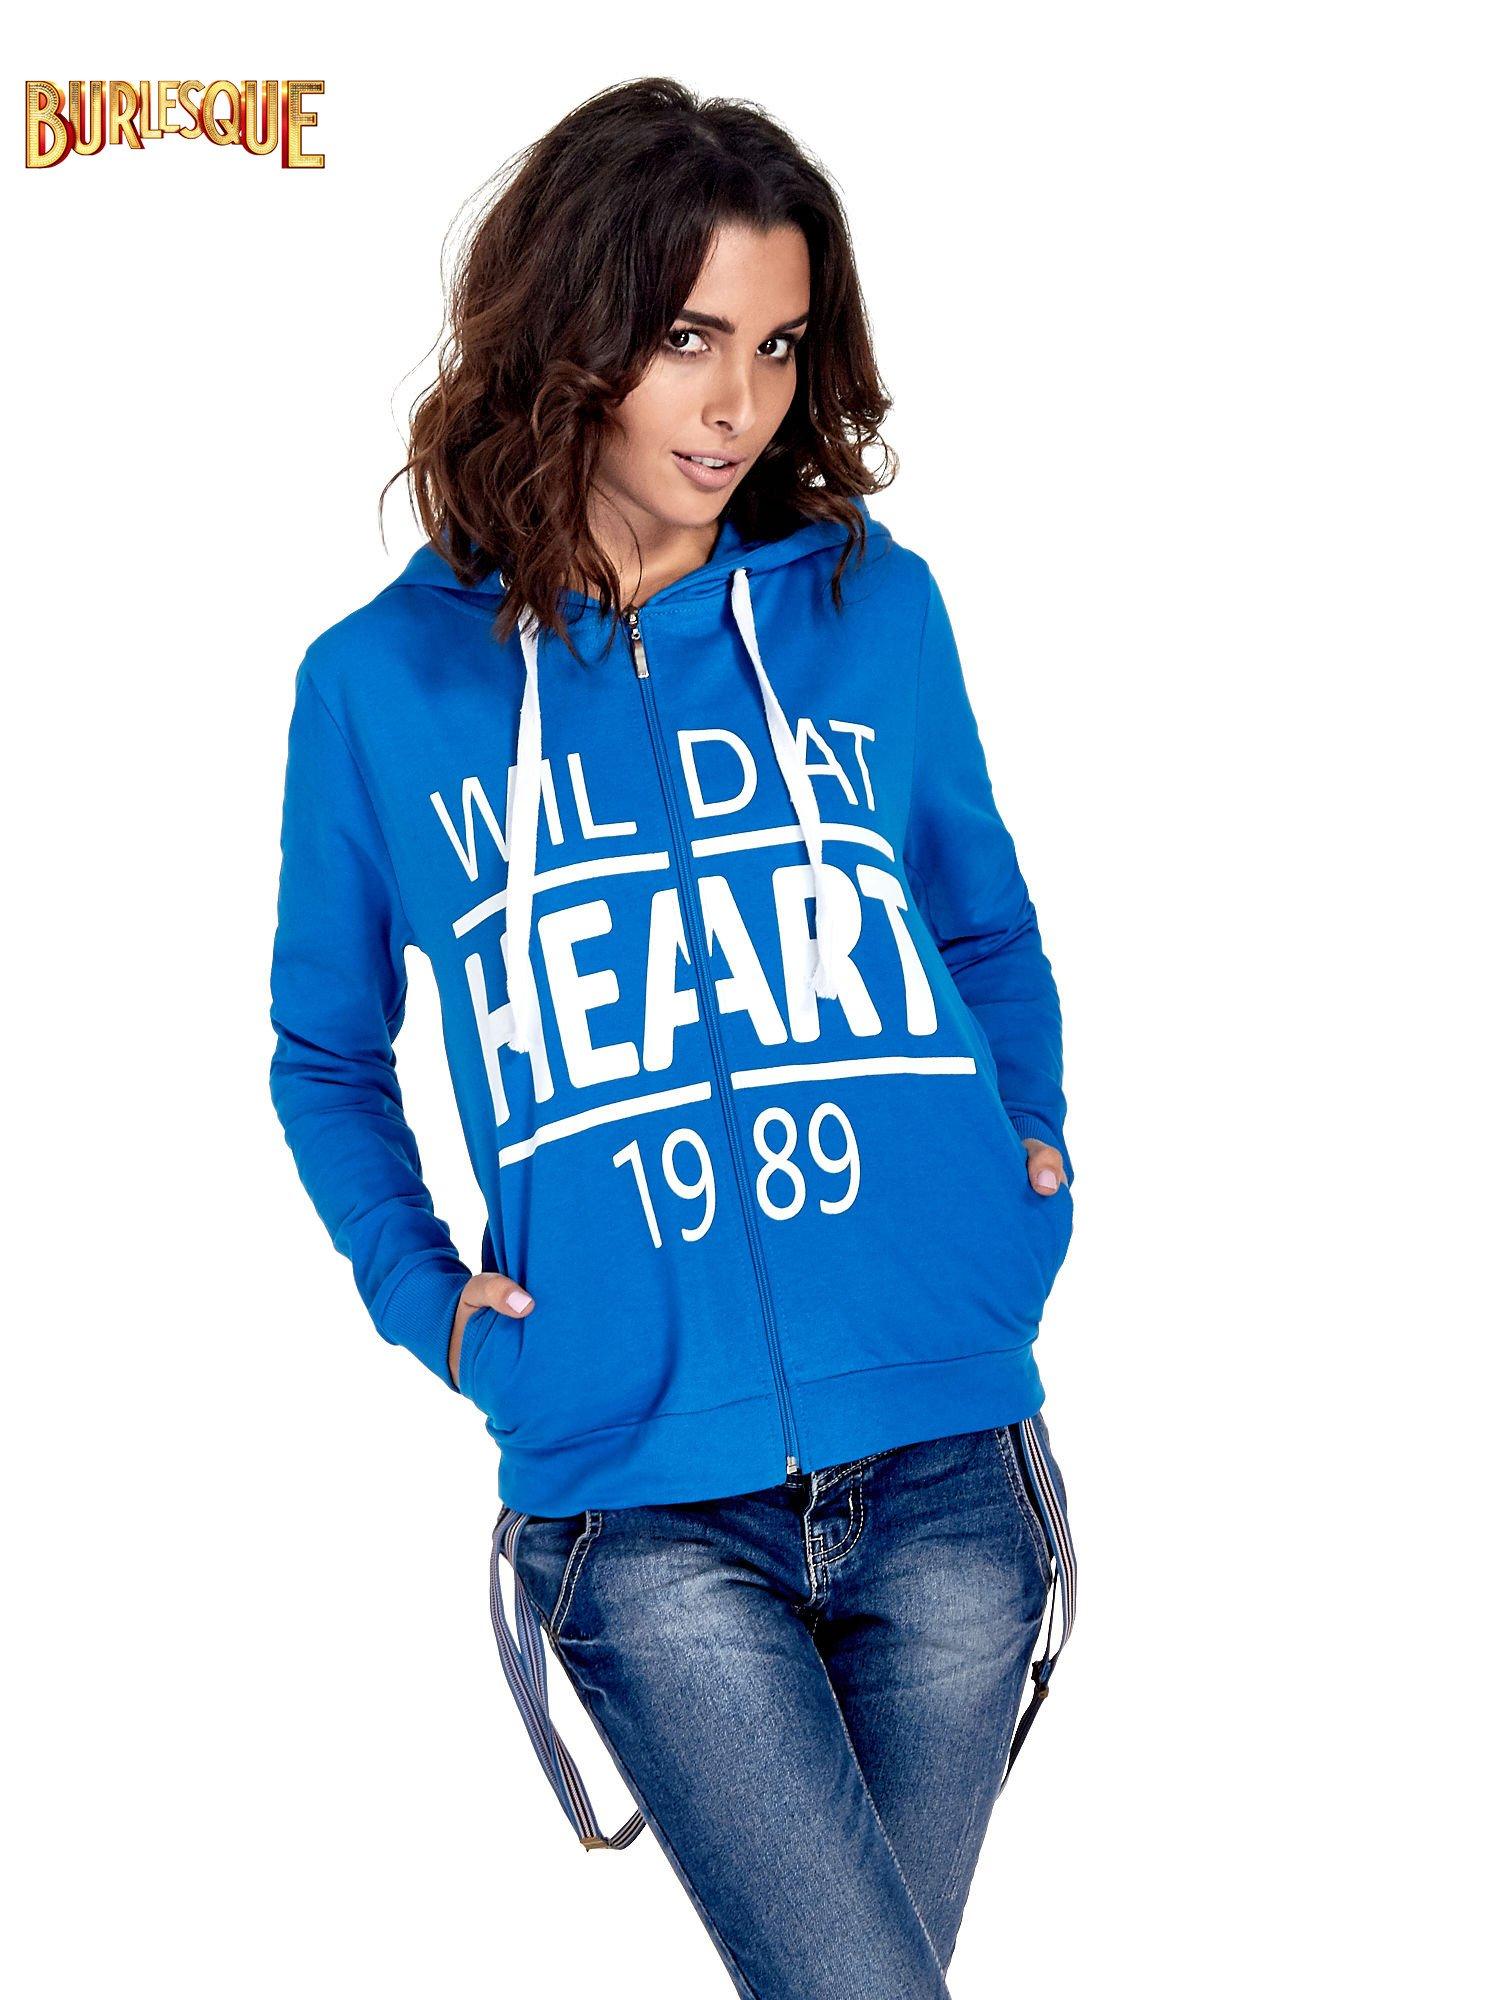 Niebieska damska bluza z kapturem i napisem WILD AT HEART 1989                                  zdj.                                  1